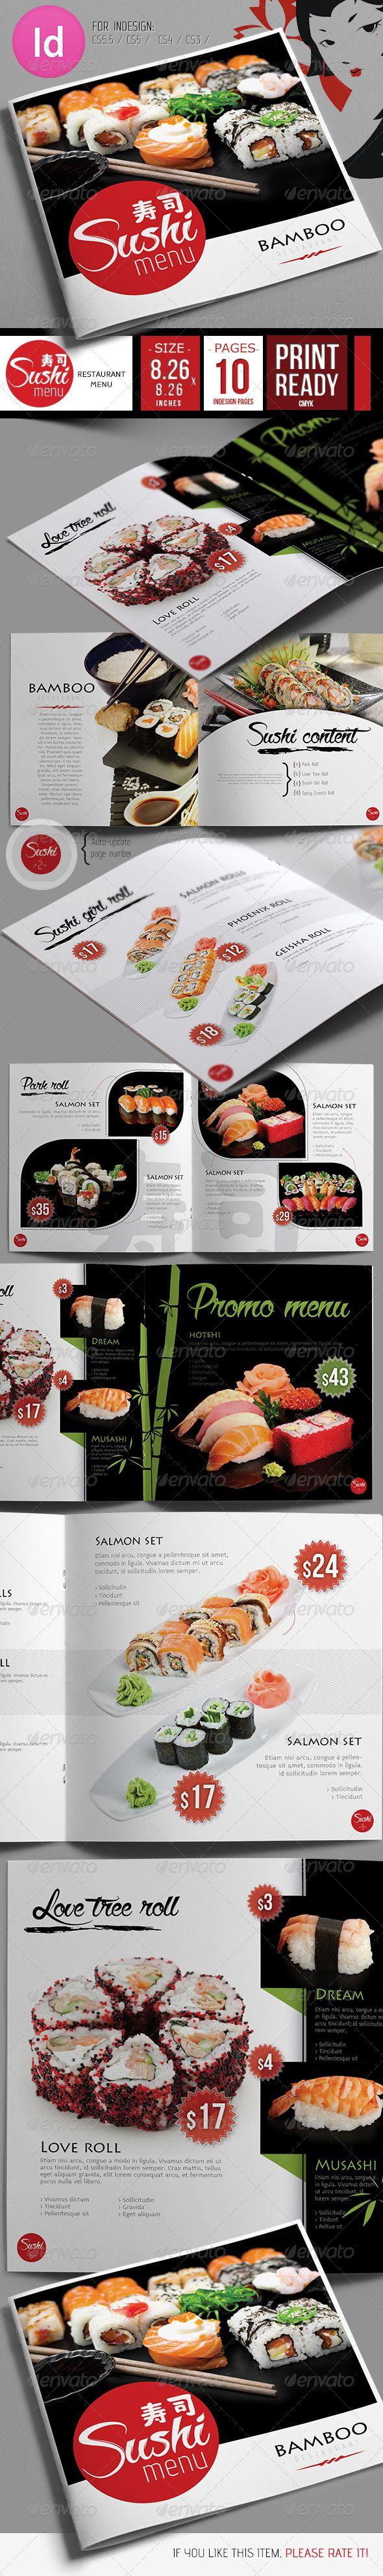 Fresh Sushi Restaurant Menu Template #design #speisekarte Download: http://graphicriver.net/item/fresh-sushi-restaurant-menu/7921728?ref=ksioks